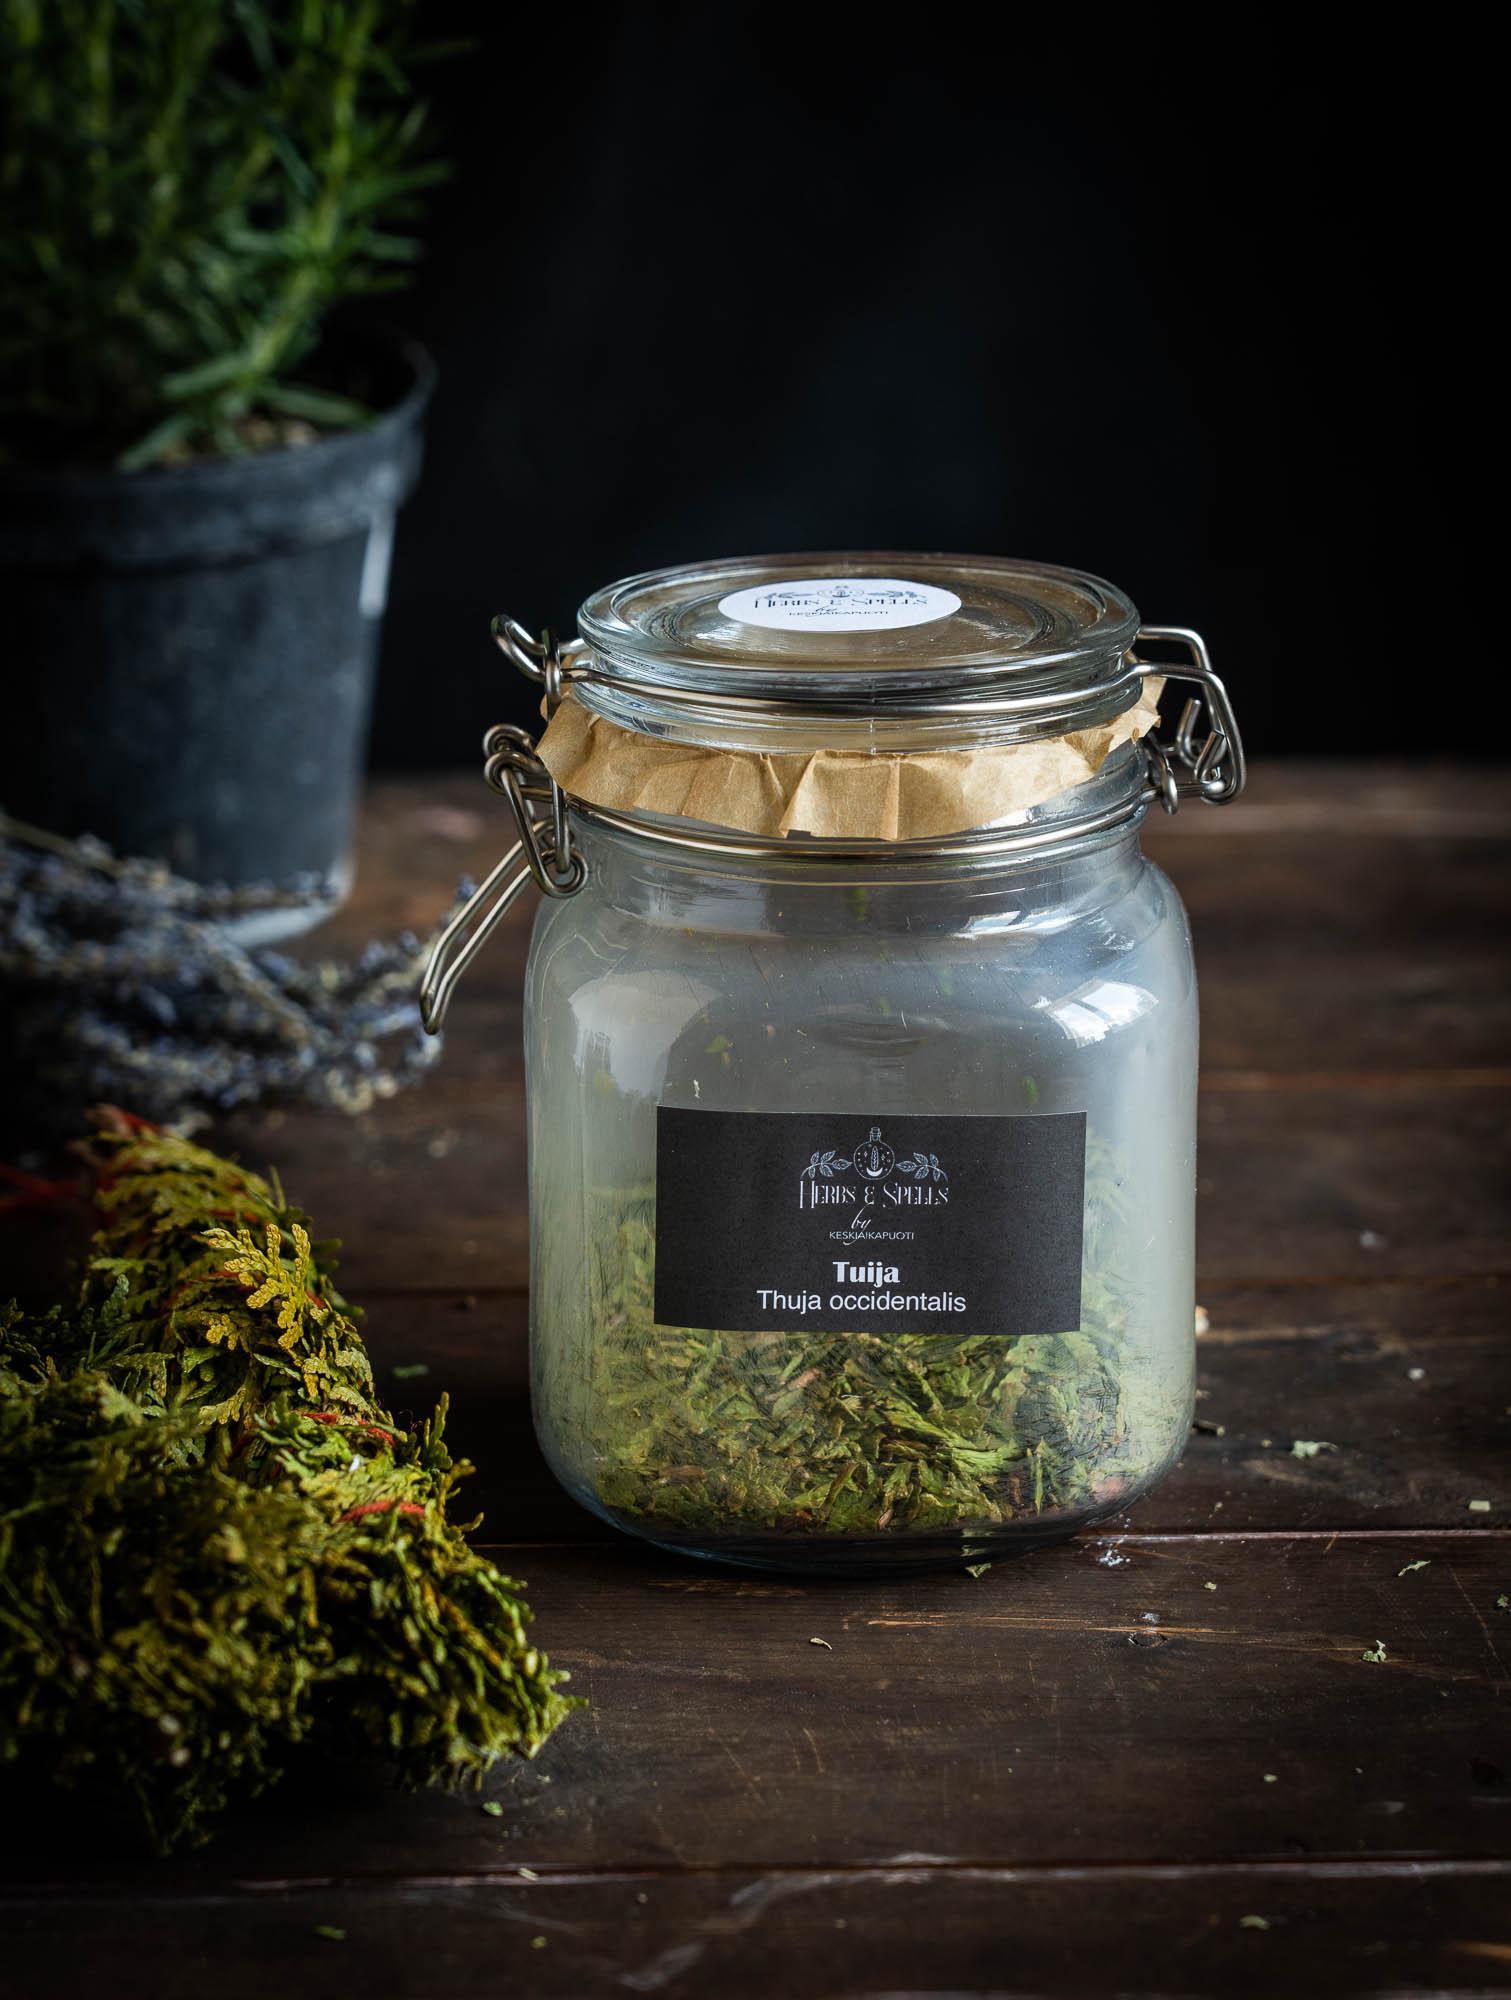 Tuija - Thuja occidentalis (Herbs&Spell by keskiaikapuoti)